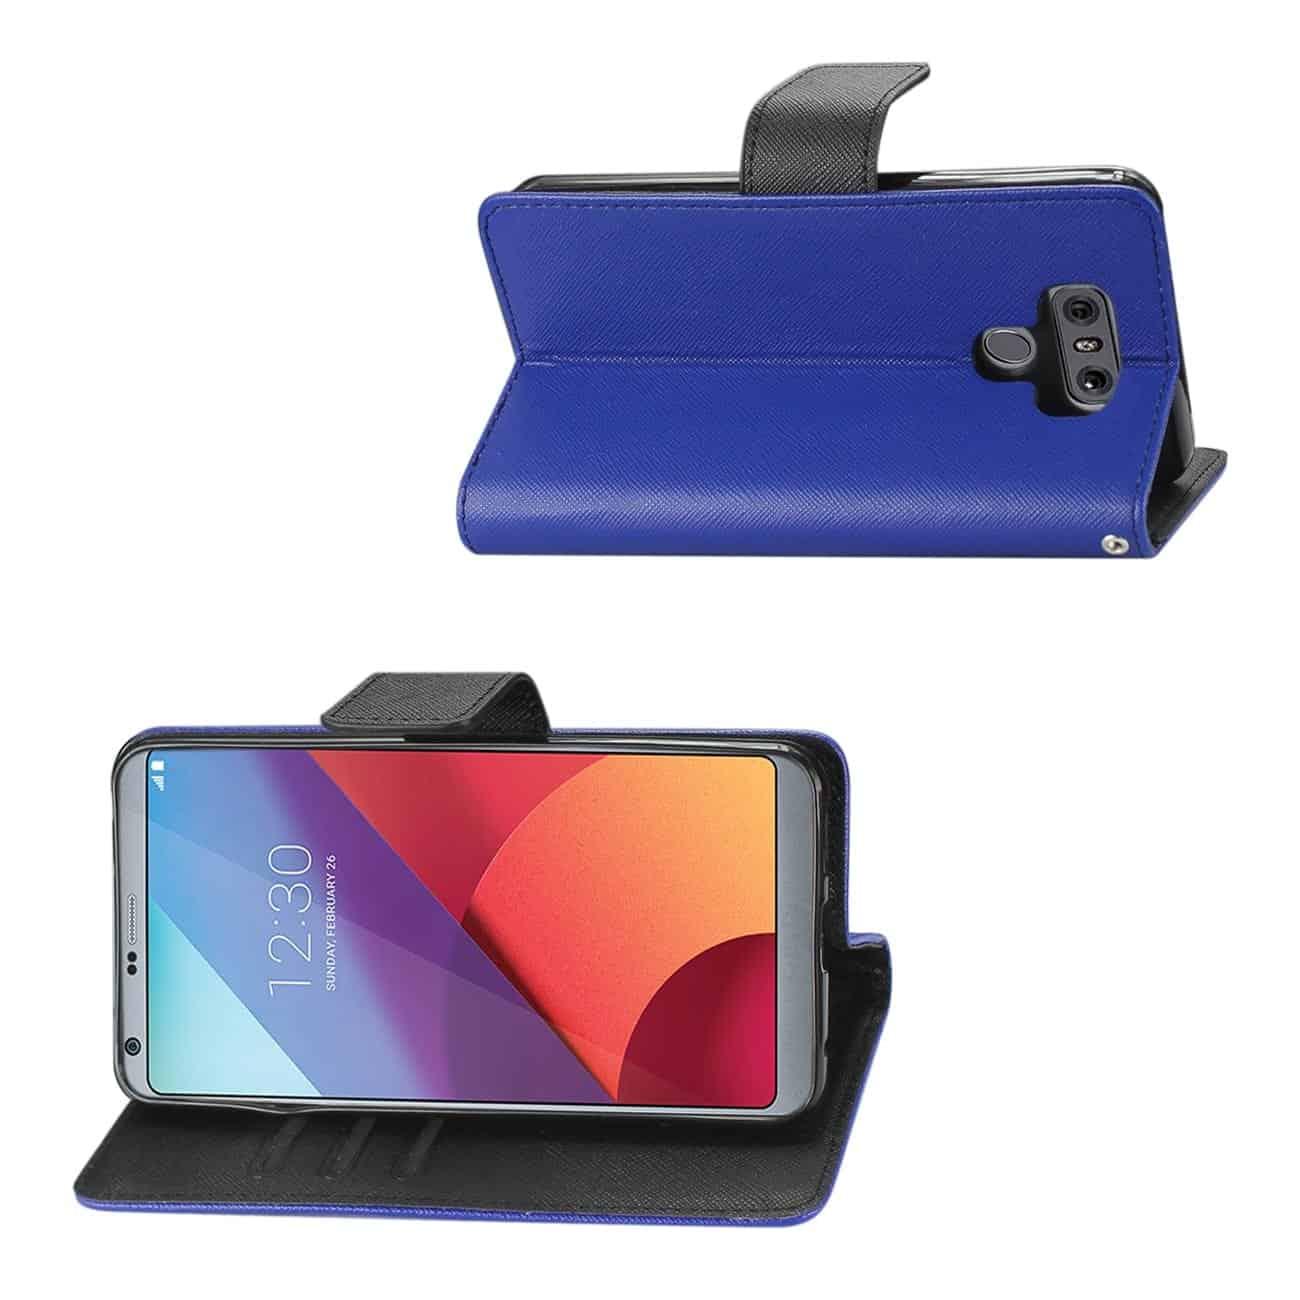 LG G6 3-IN-1 WALLET CASE IN NAVY